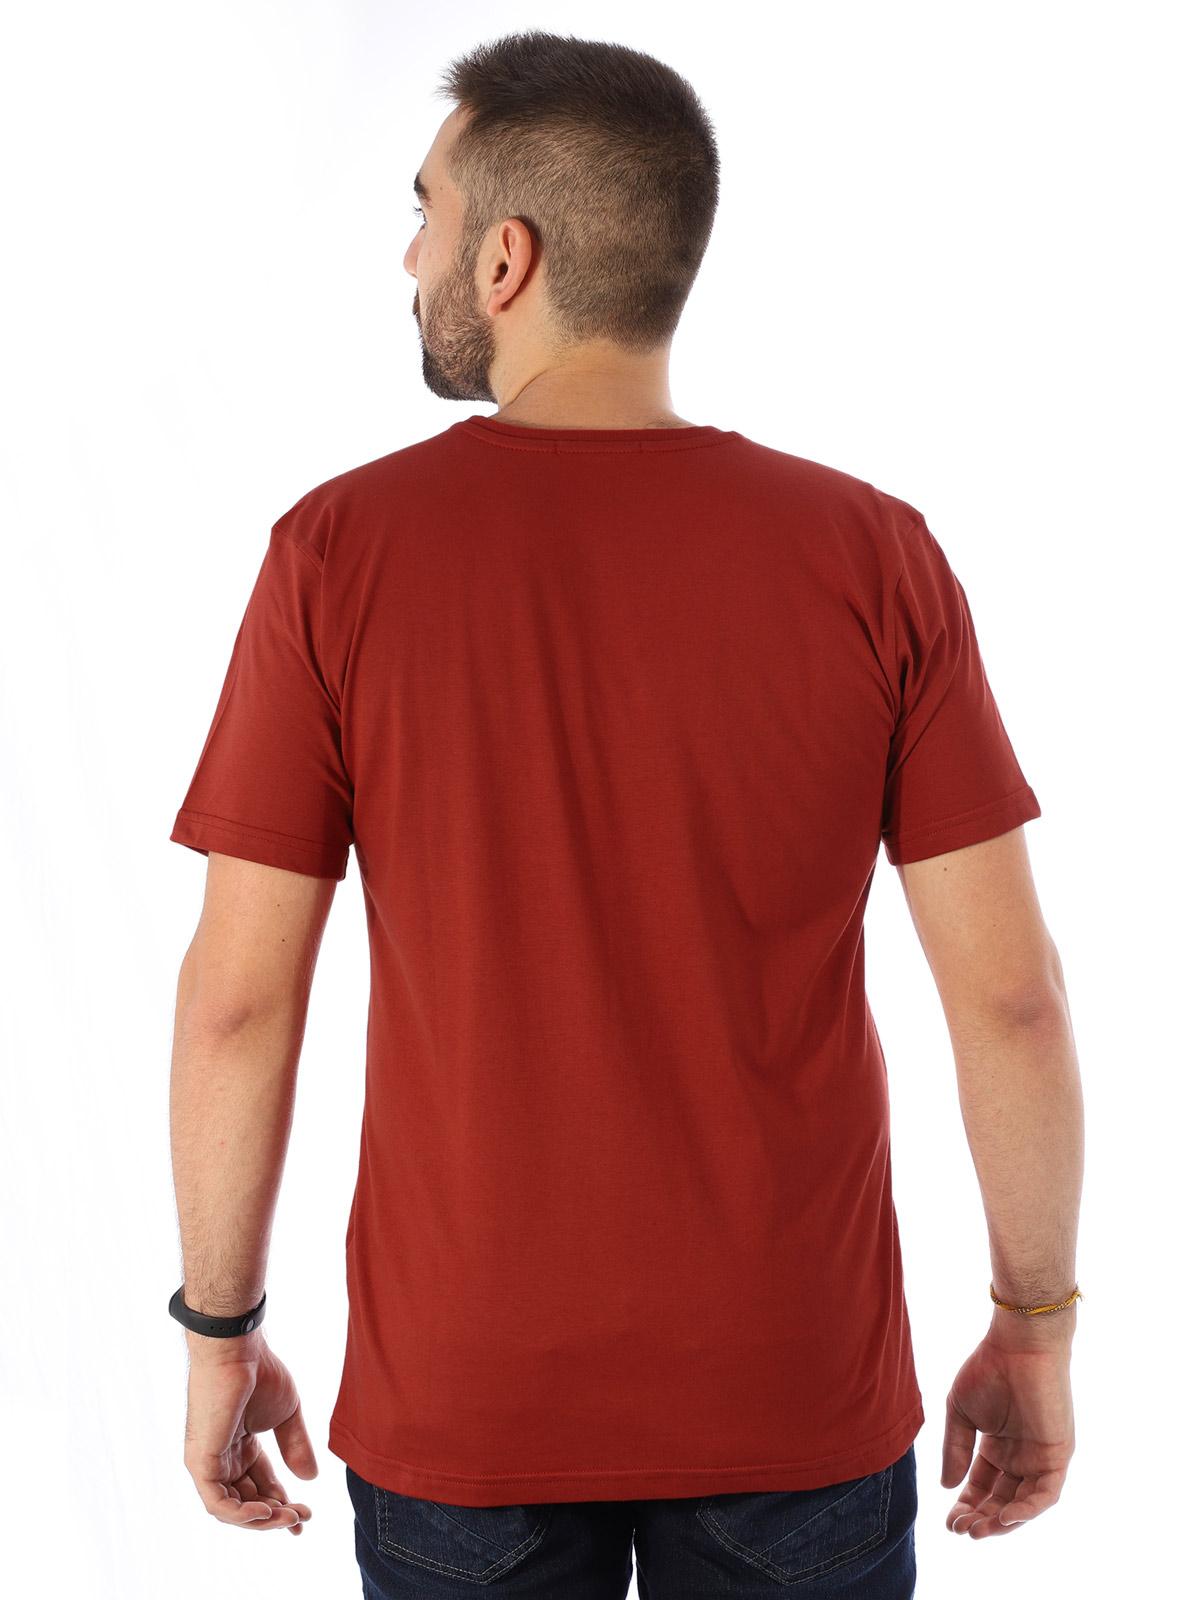 Camiseta Masculina Manga Curta Básica Devils Ferrugem